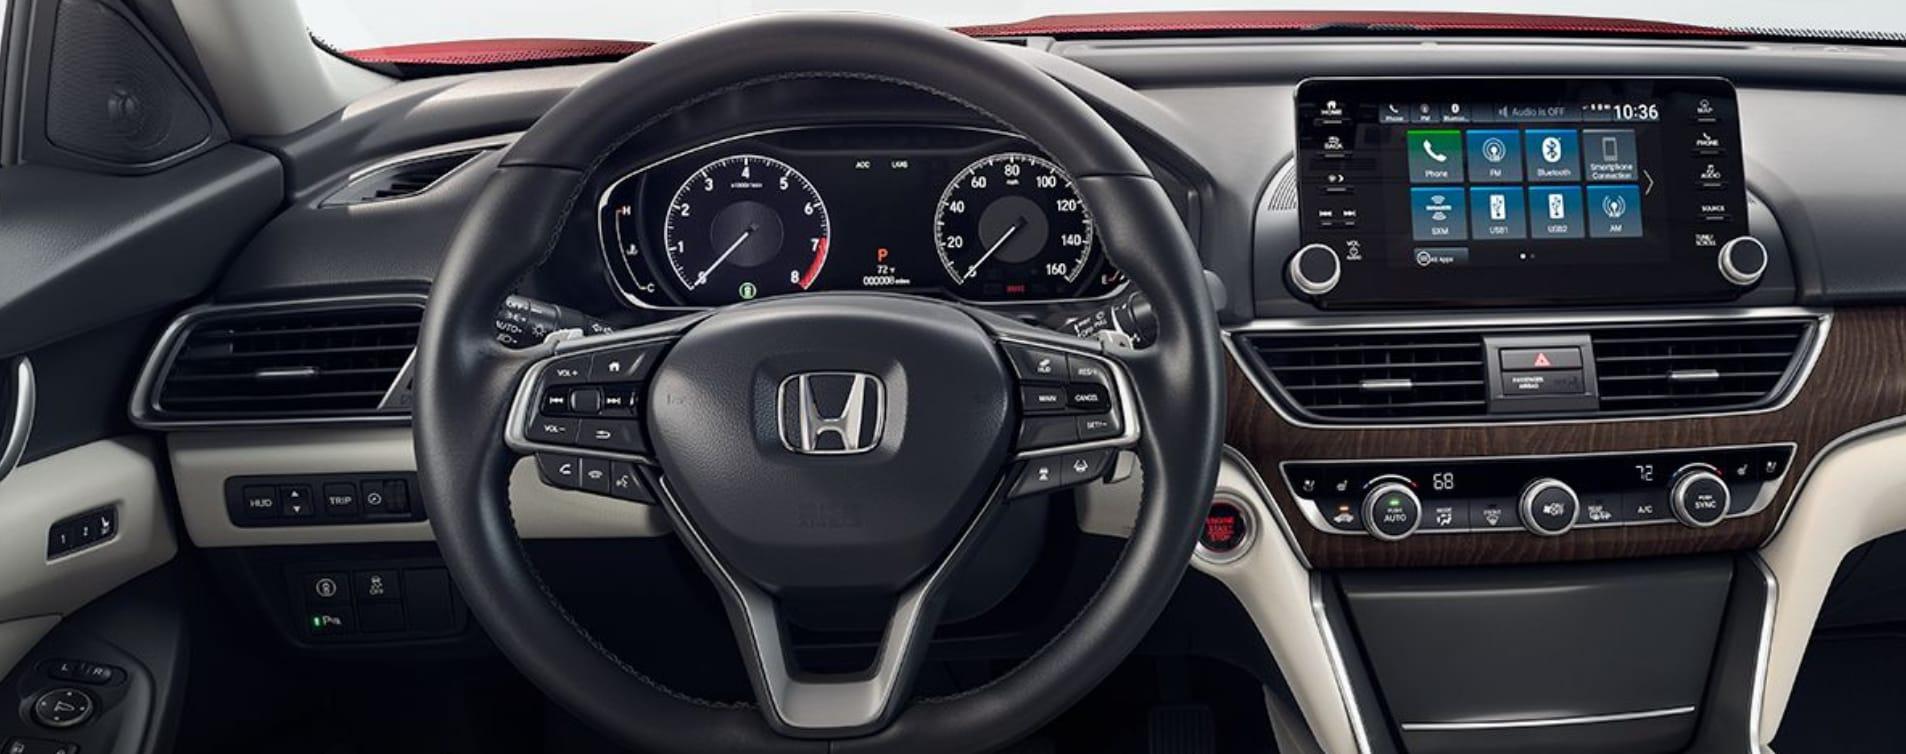 Honda Accord In Greensboro 2018 Accord